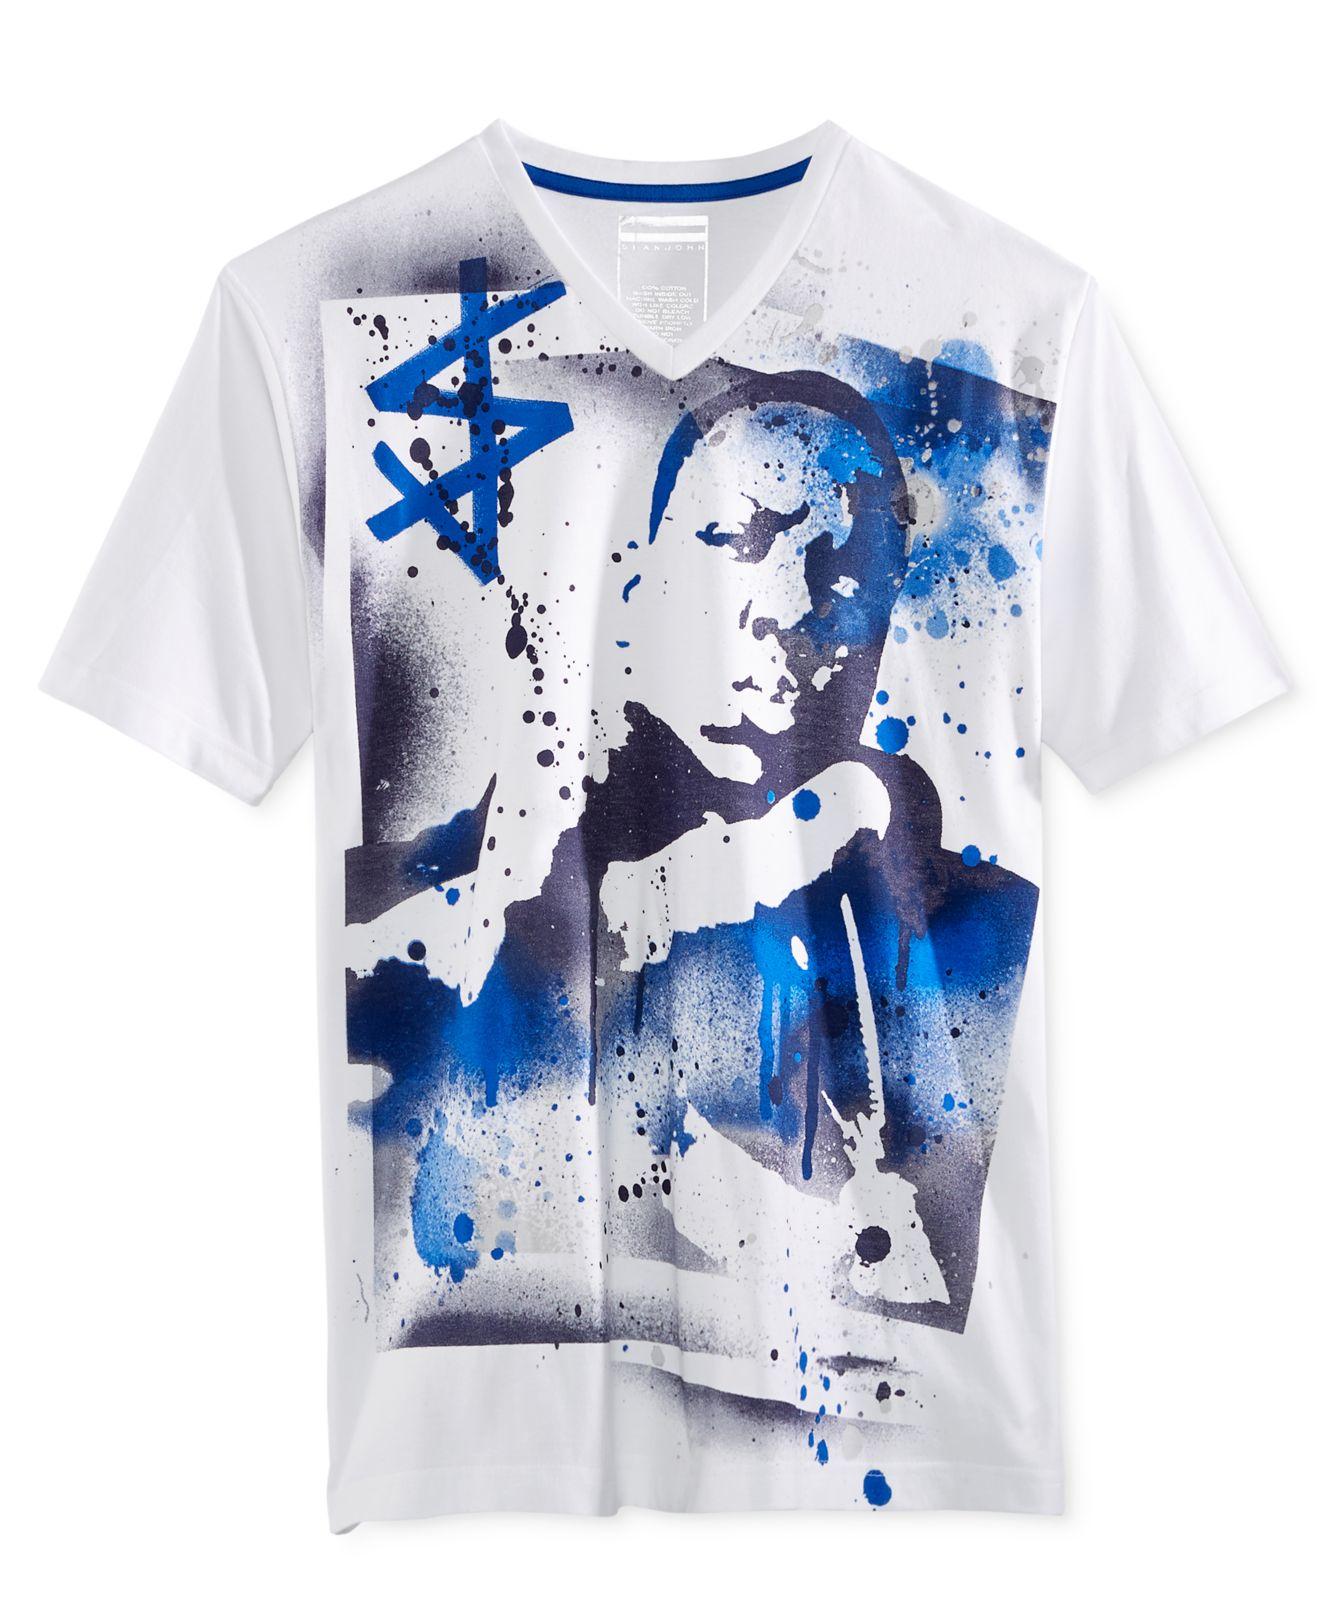 Sean john men 39 s street art graphic print v neck t shirt in for Sean john t shirts for mens